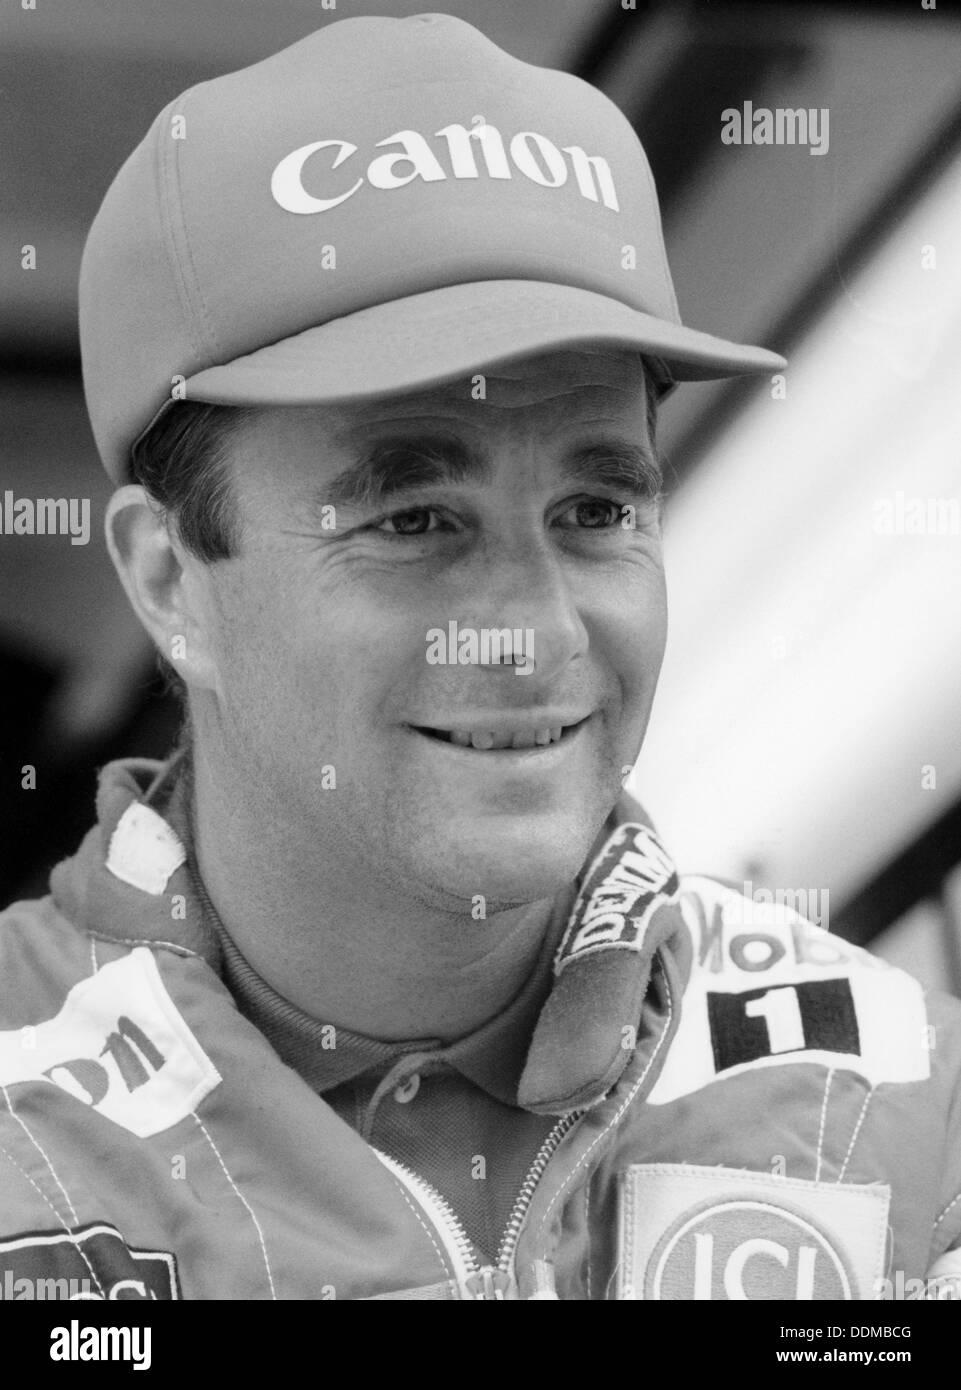 Nigel Mansell, c1985-c1992. - Stock Image